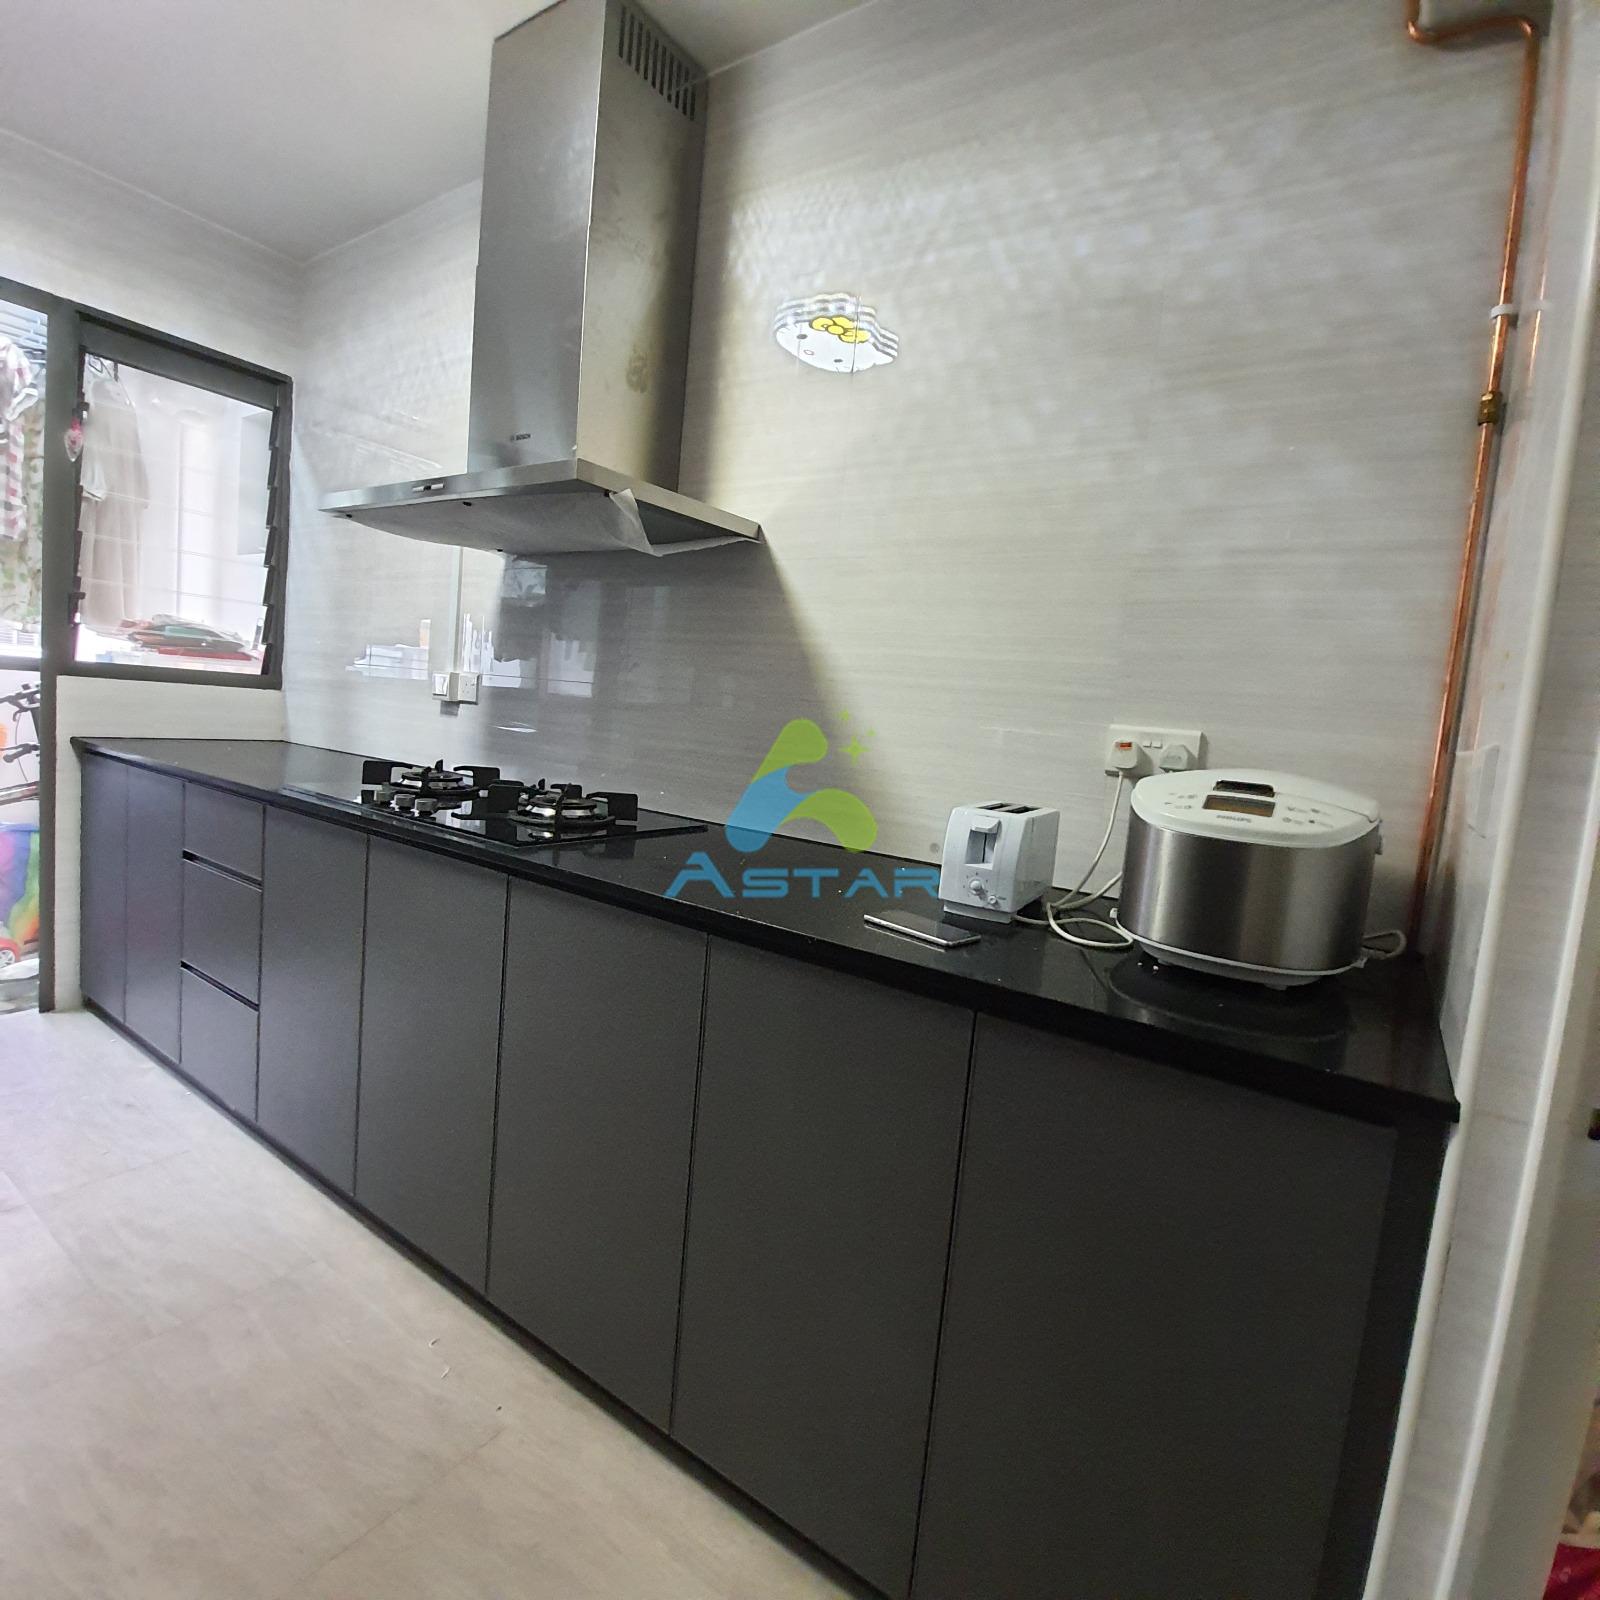 a star furnishing projects Blk 478A Yishun St 44 06